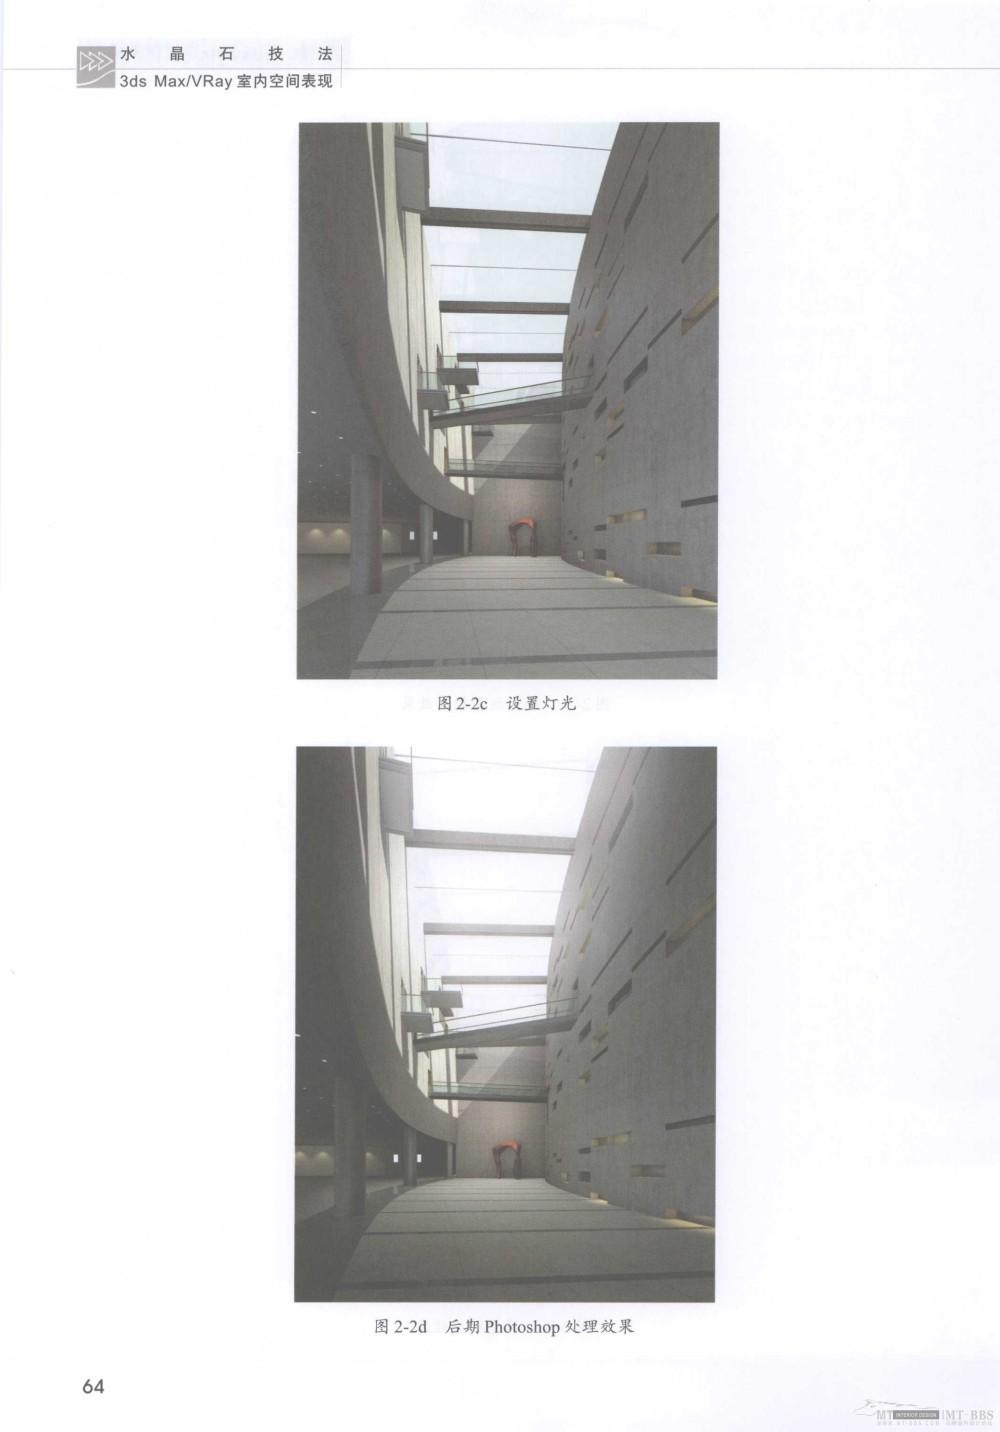 水晶石技法-3ds_Max&VRay室内空间表现_水晶石技法-3ds_Max&VRay室内空间表现_页面_070.jpg